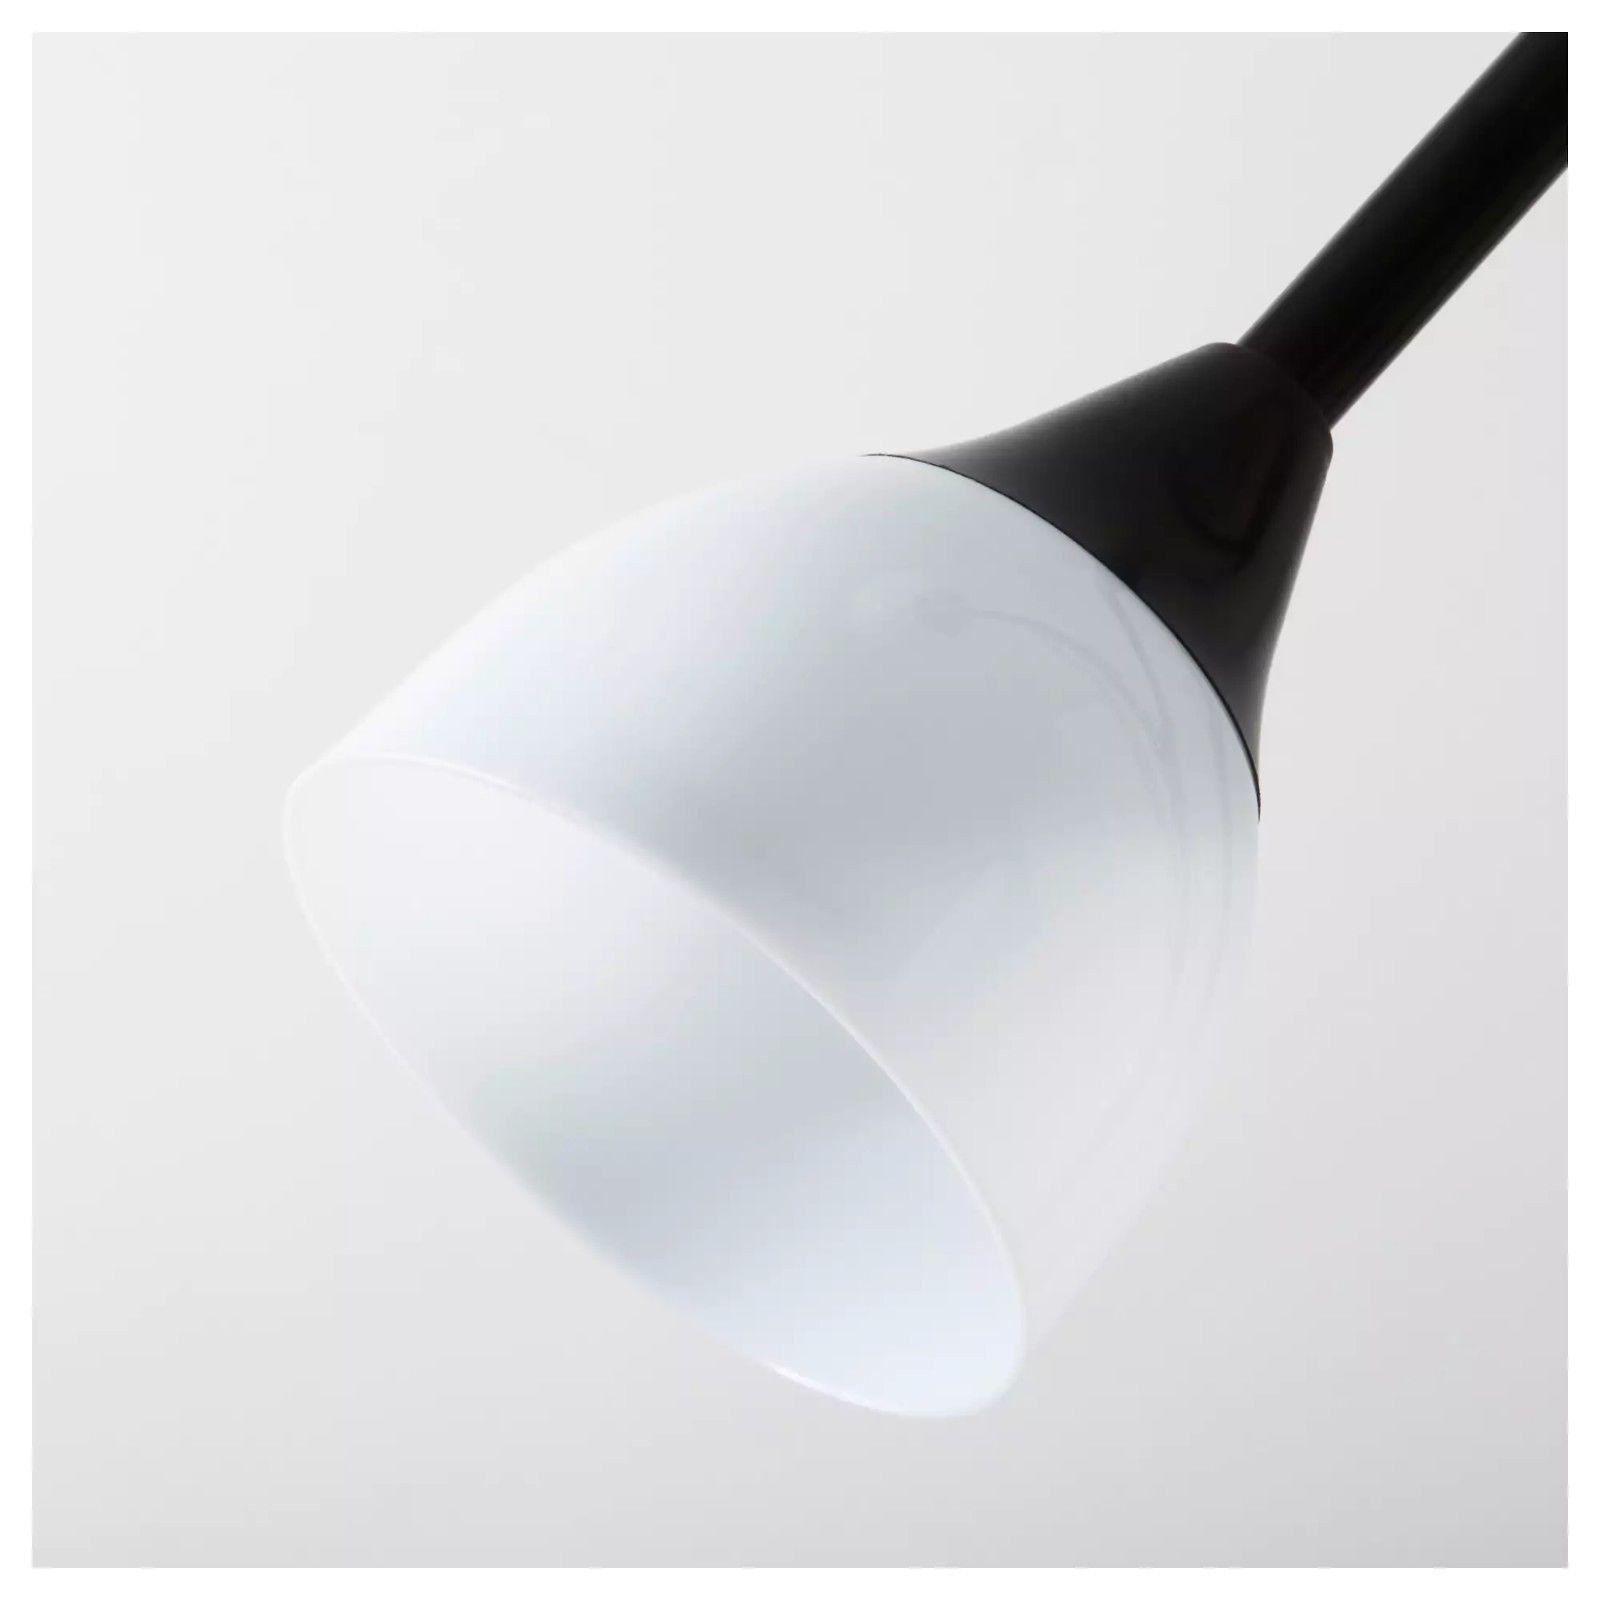 Lampada piantana da terra 176 cm ikea not nero lgv shopping for Lampada piantana ikea